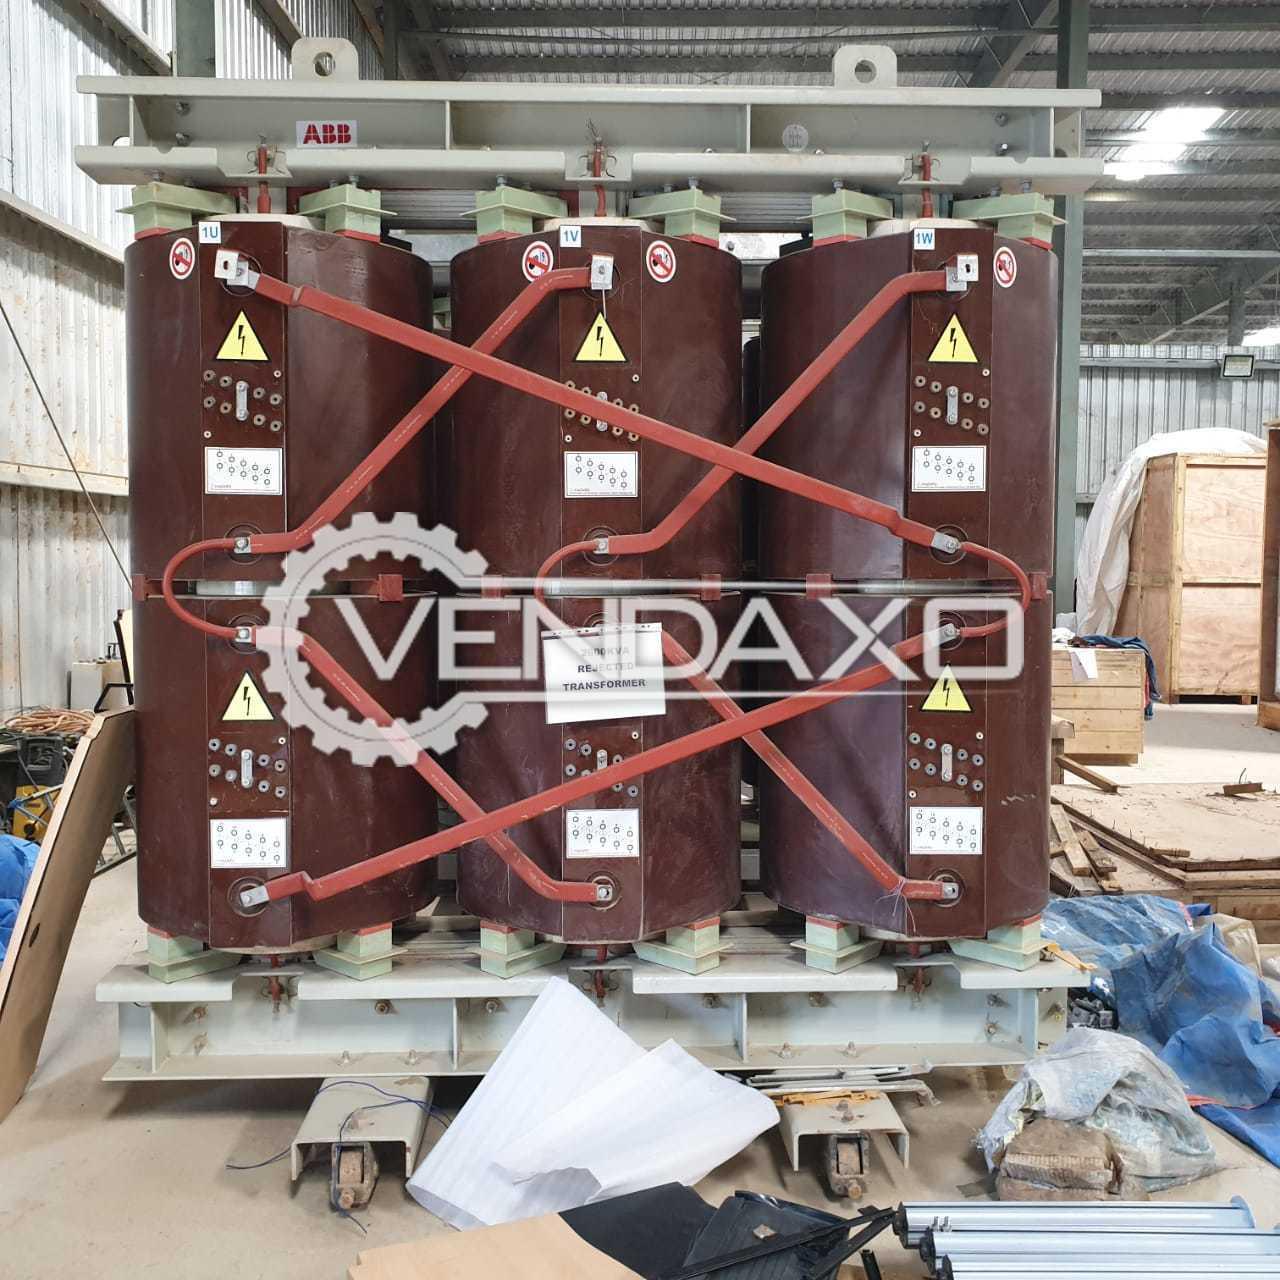 3 Set OF ABB Transformers - 2500 Kva